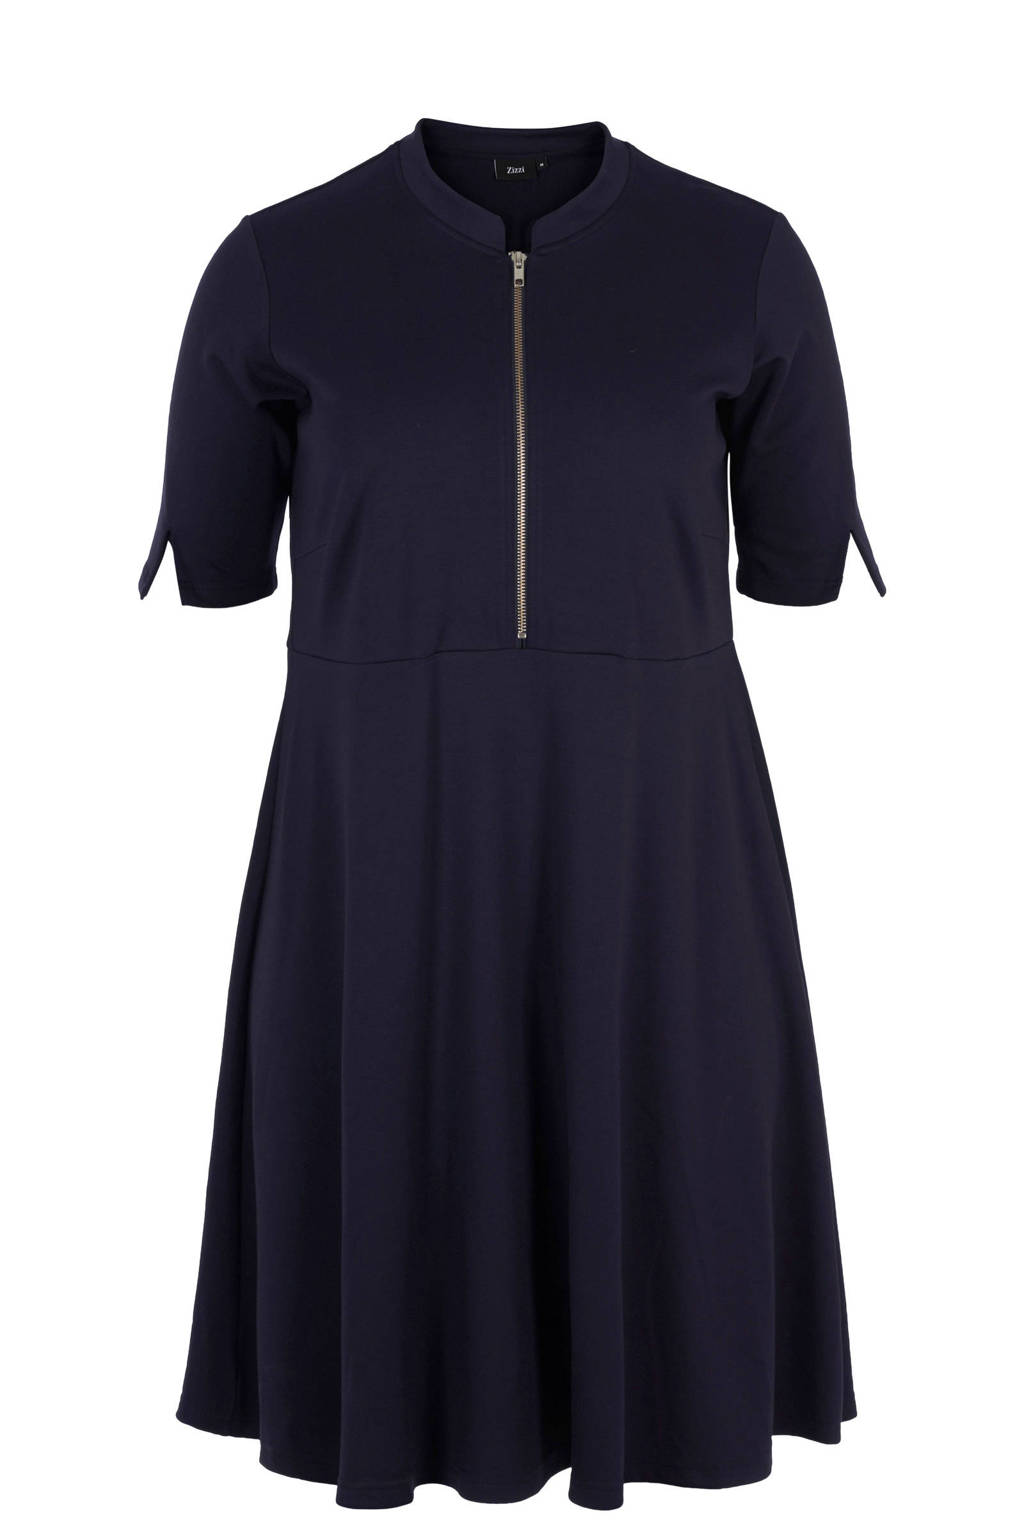 Zizzi jurk met rits, Donkerblauw